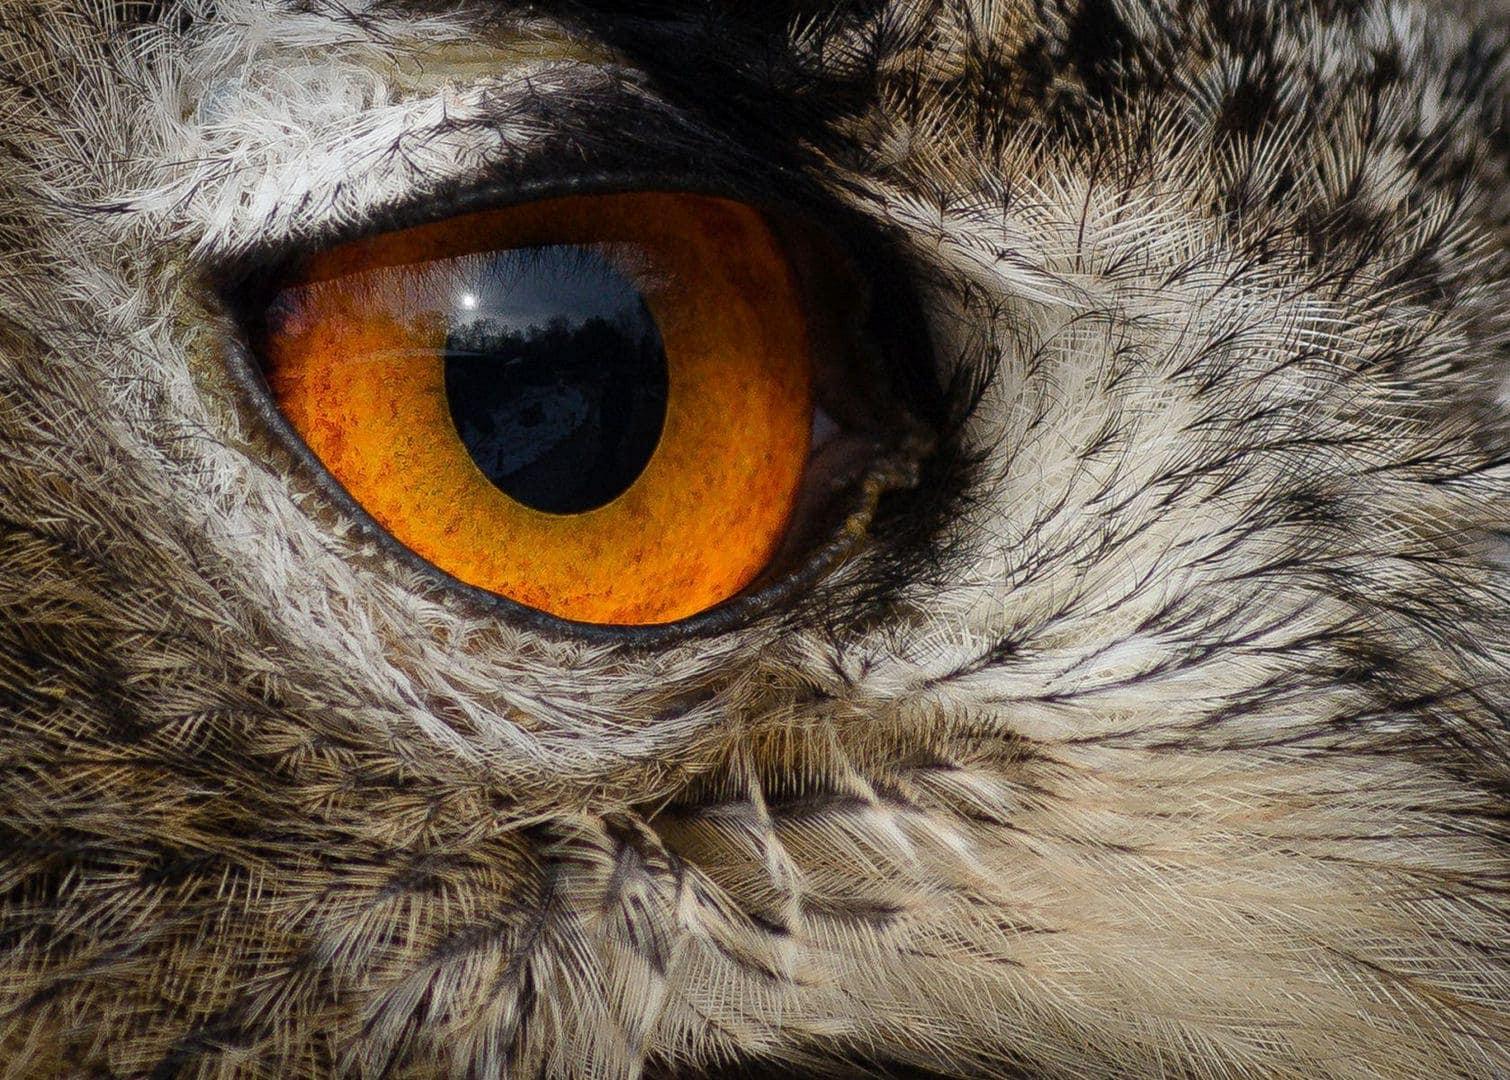 Scharfe Augen